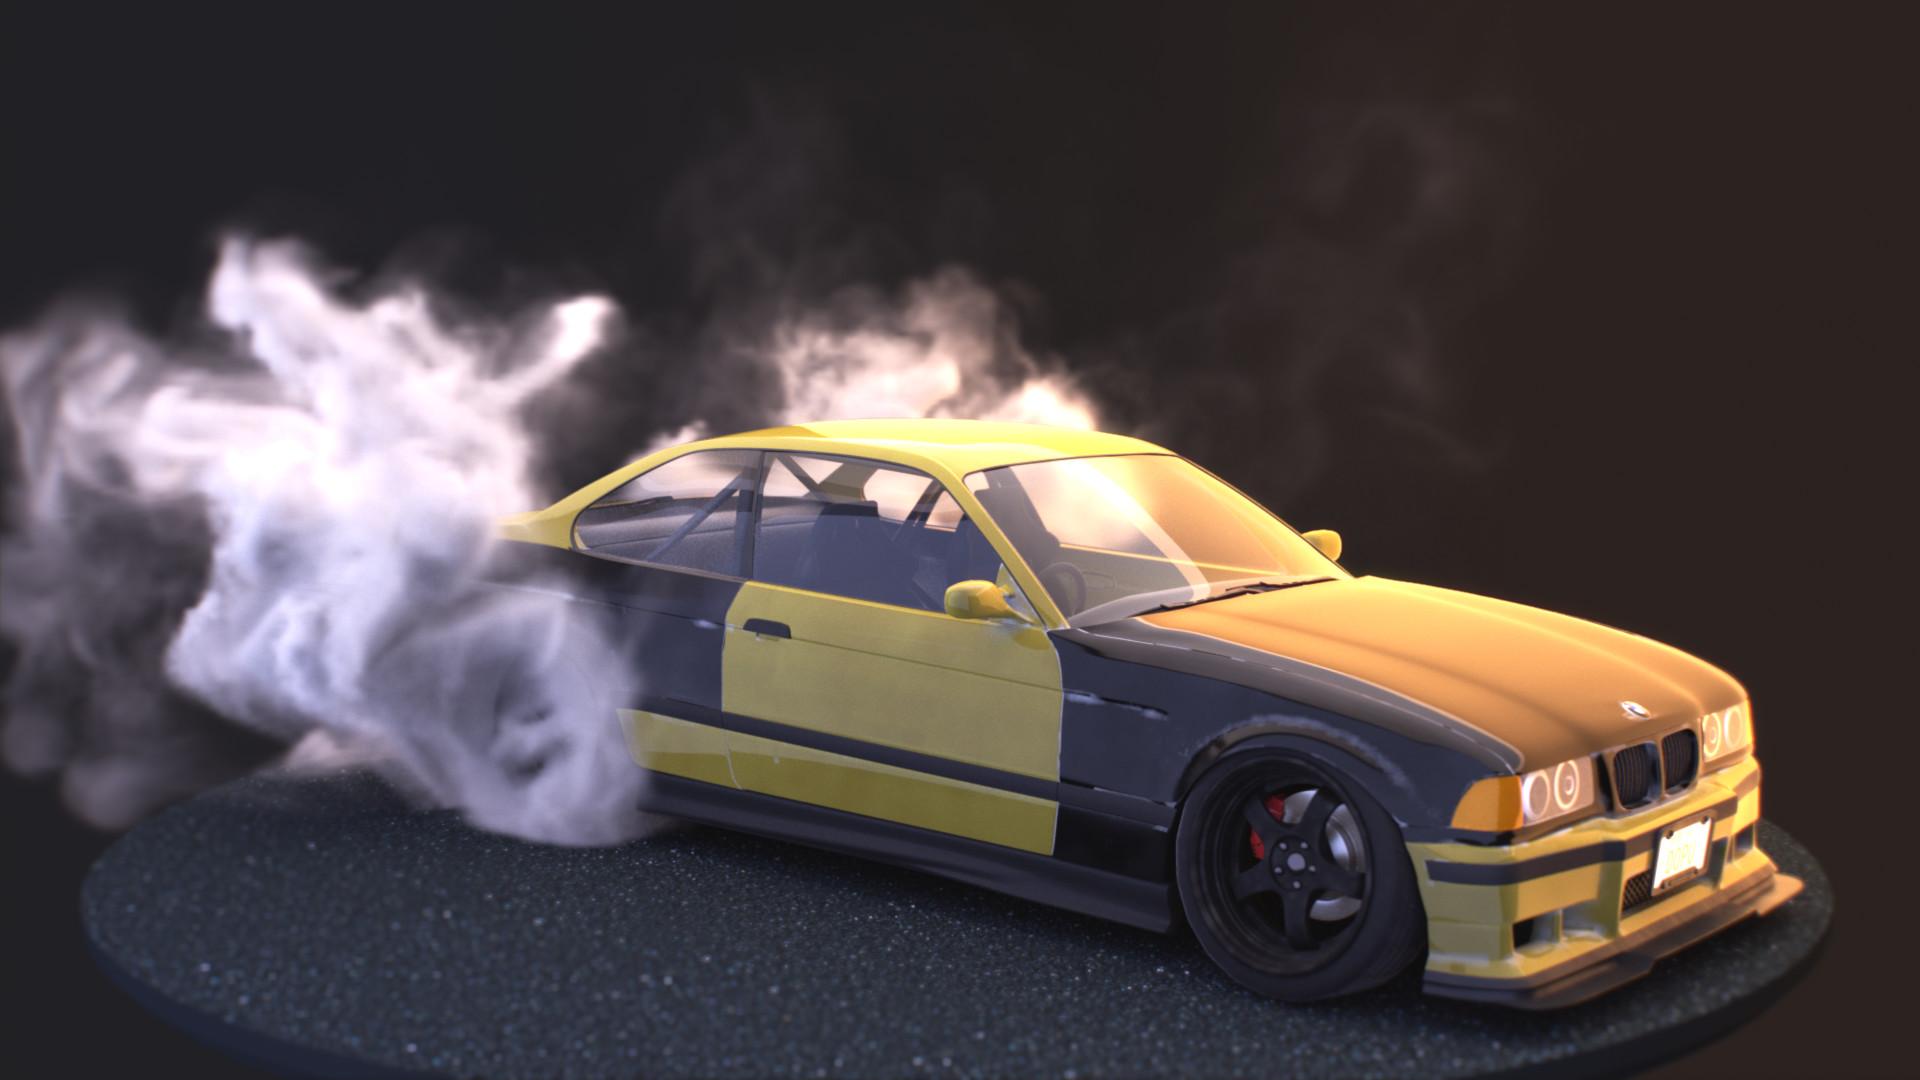 Daniel Du Plessis Drift Spec Bmw M3 E36